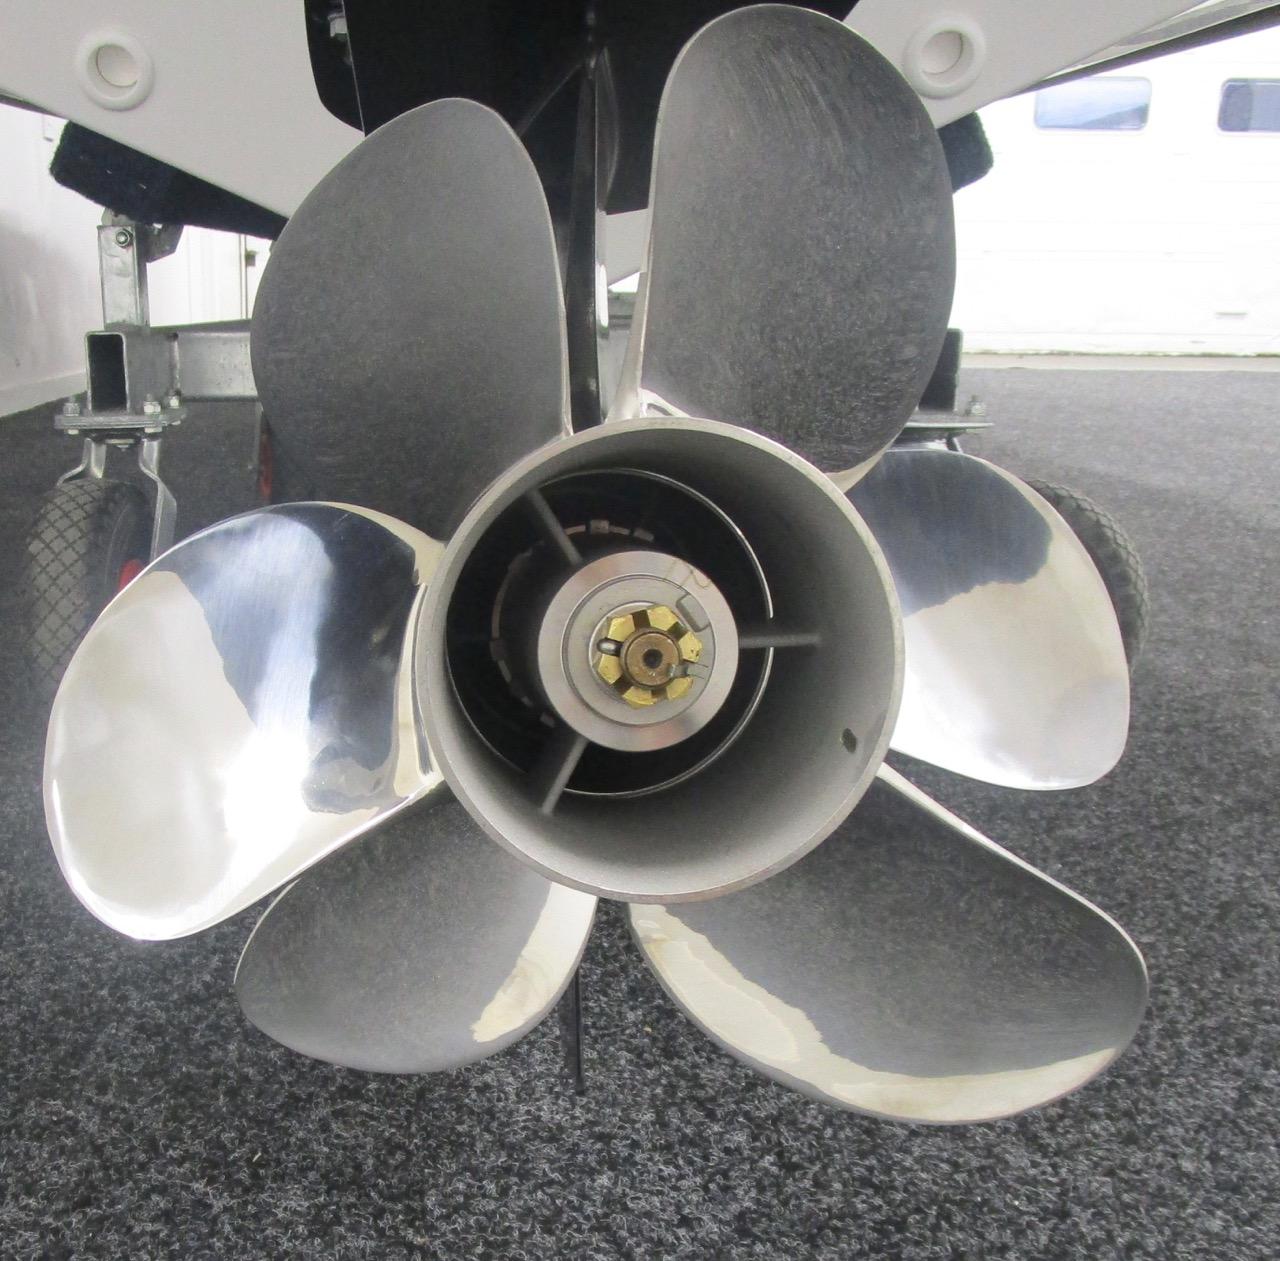 Suzuki DF350ATXX counter-rotating duo prop giving 6 blades of thrust